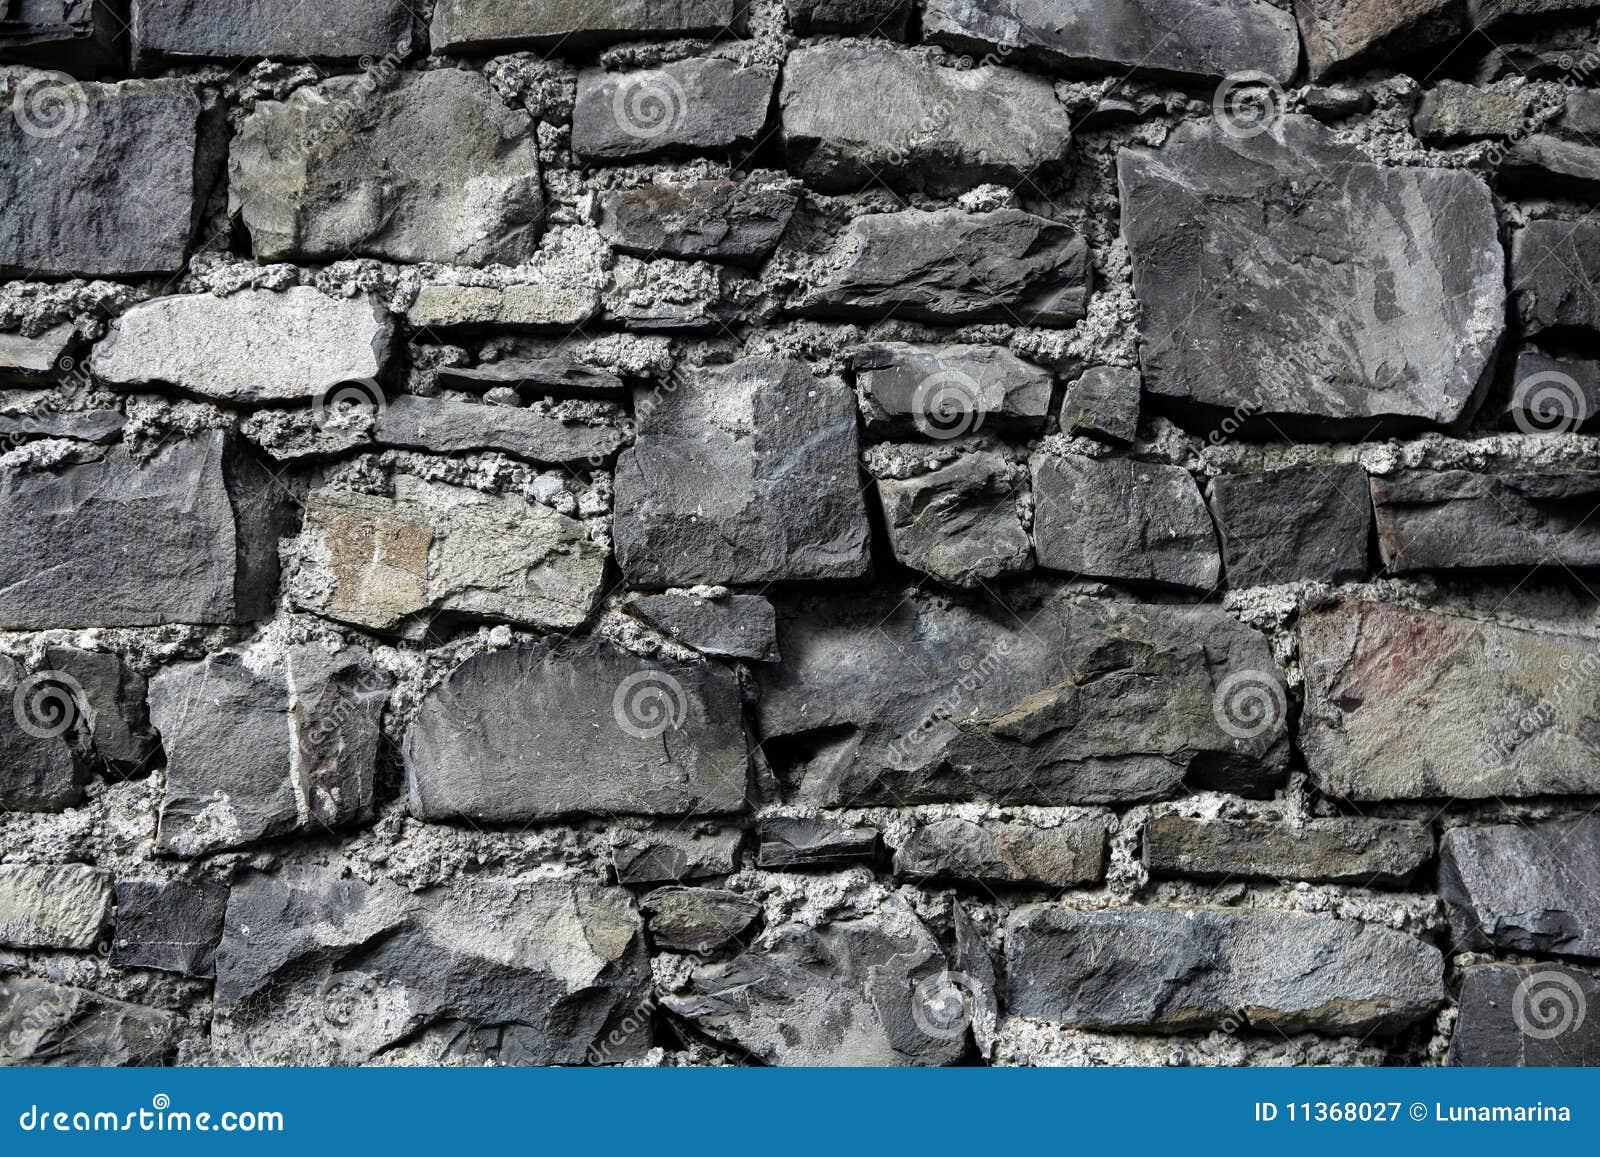 Antique Grunge Old Gray Stone Wall Masonry Stock Image